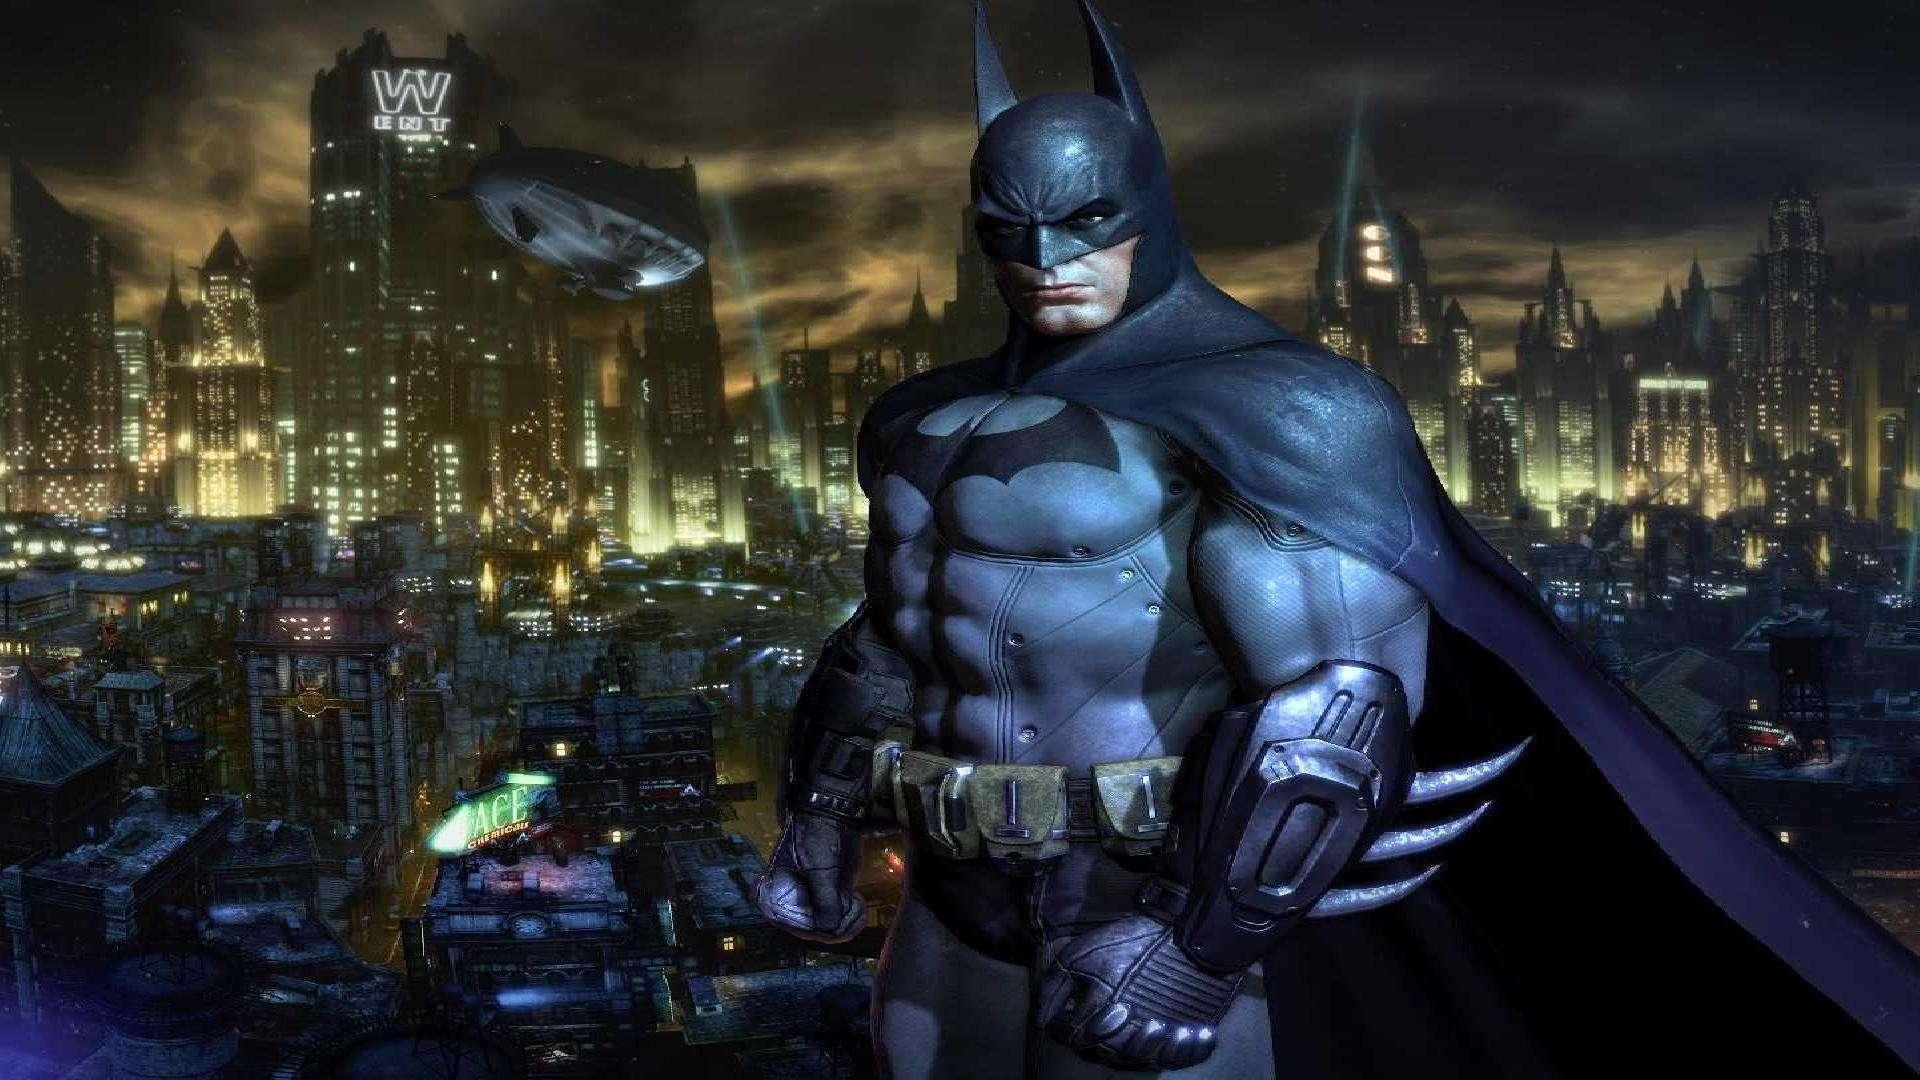 Hd wallpaper upload - Wallpaper Batman Beyond Hd Wallpapers 1080p Upload At August 27